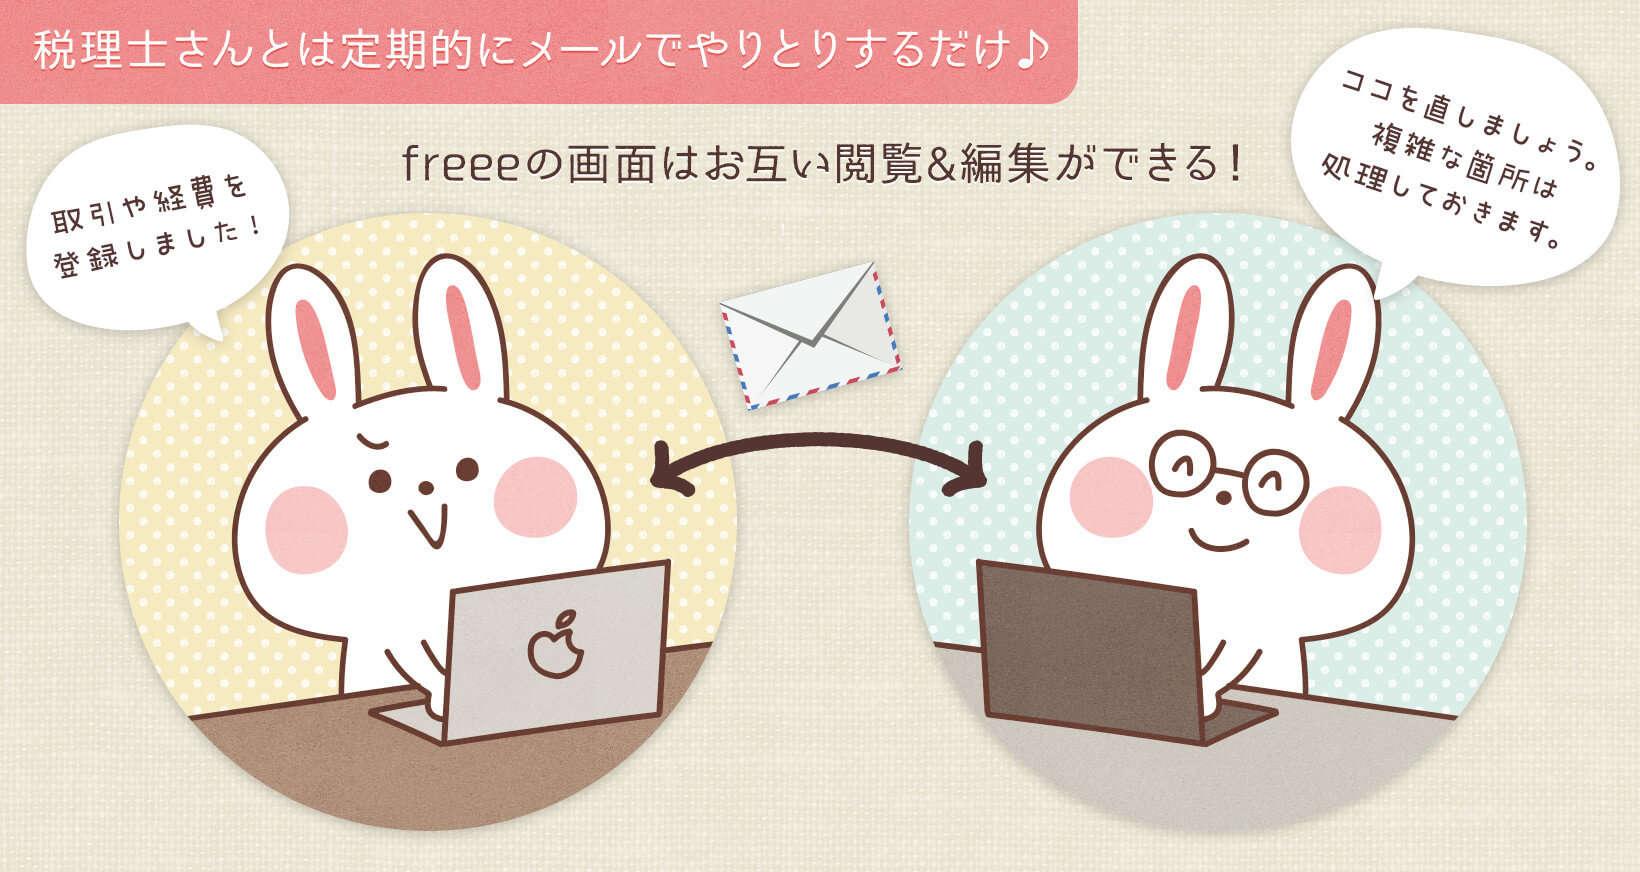 freee 確定申告 オンライン会計ソフト 公認税理士 やりとり